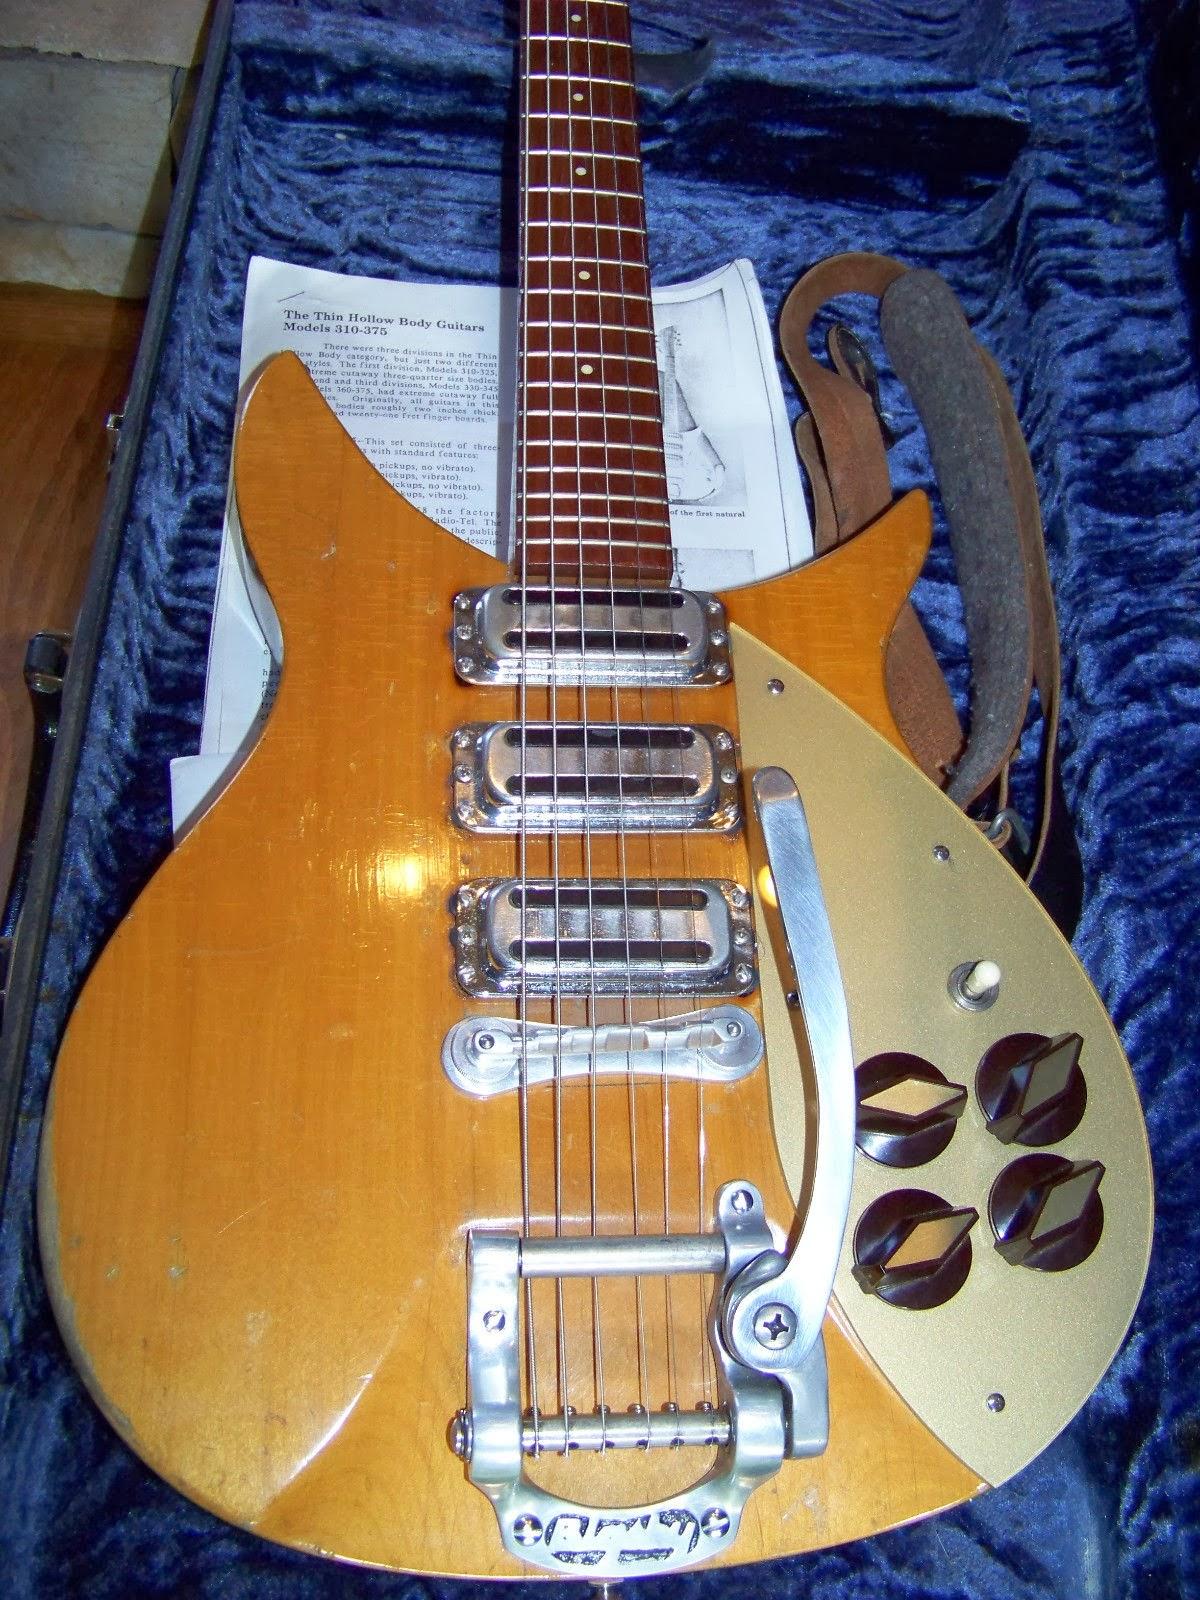 vintage guitarz rickenbacker 325 carpi 1958 v82 john lennon vintage Rickenbacker 330 Wiring Diagram rickenbacker 325 carpi 1958 v82 john lennon vintage